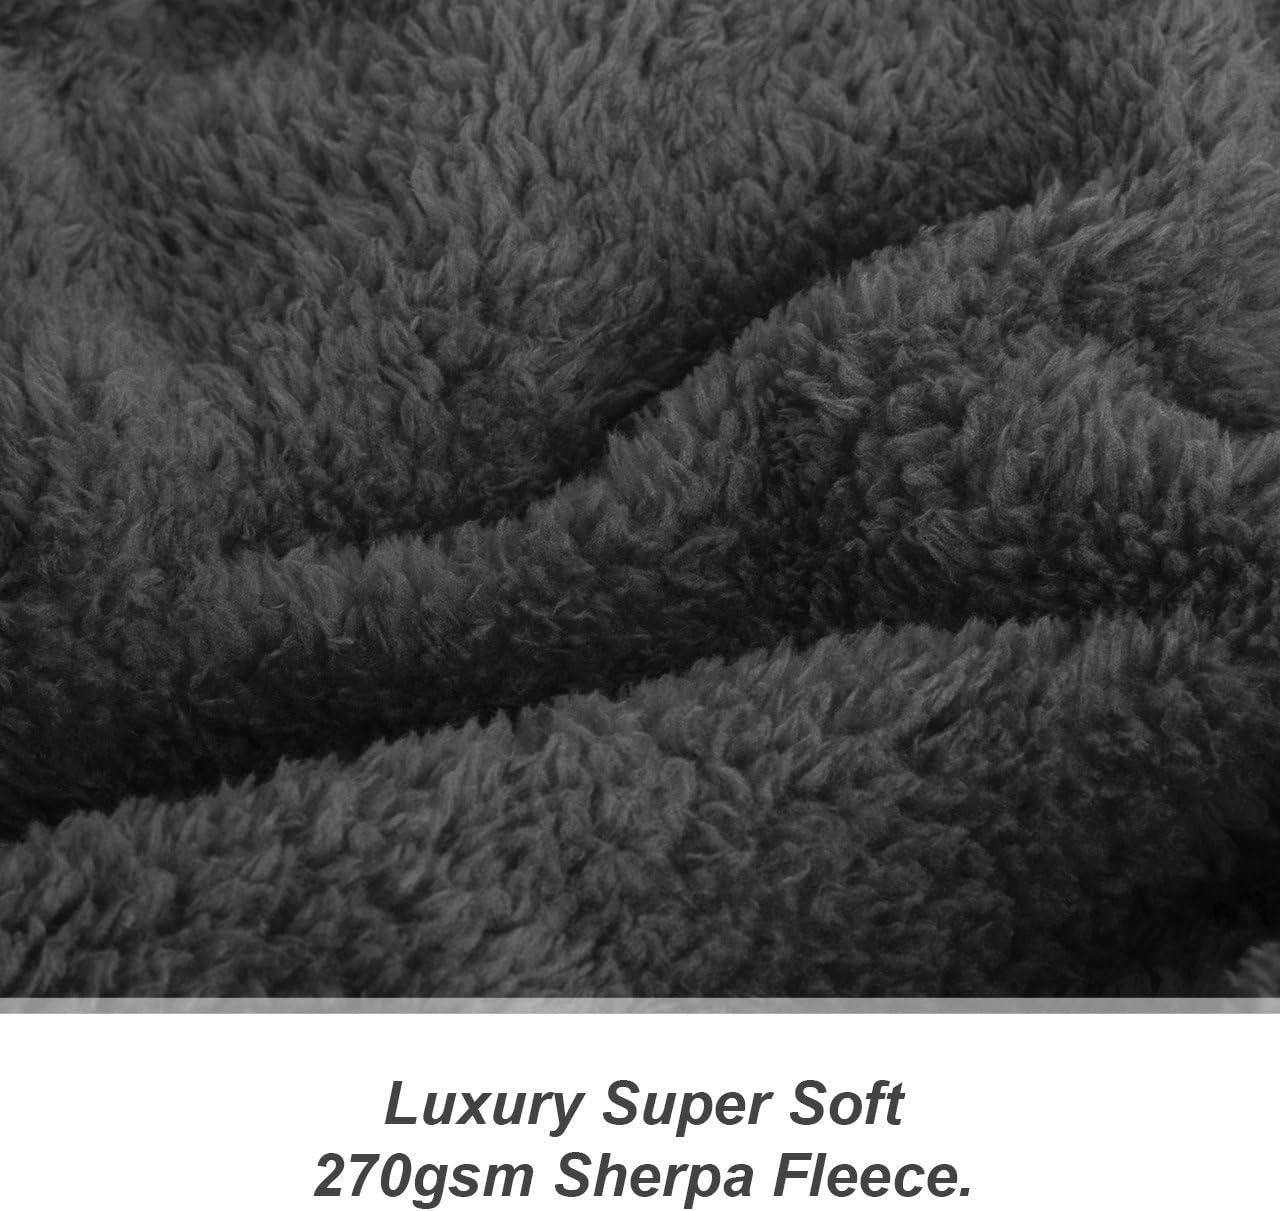 127 x 178 cm Manta de Lana Sherpa Snug Rug Special Edition Luxury Teal